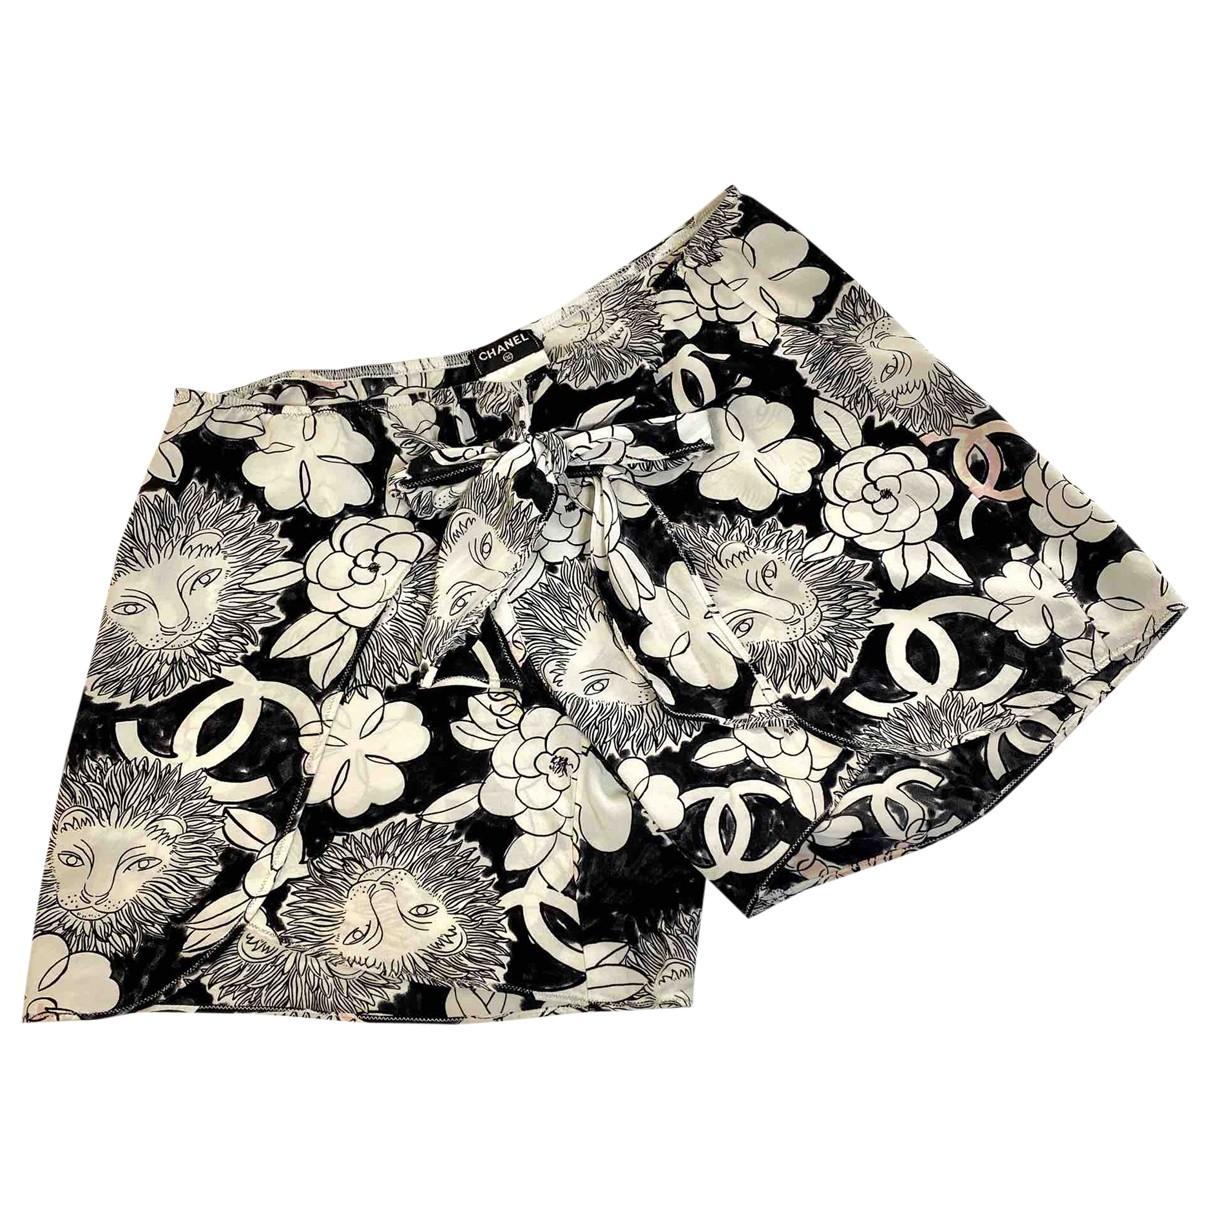 Chanel \N Shorts in  Schwarz Seide